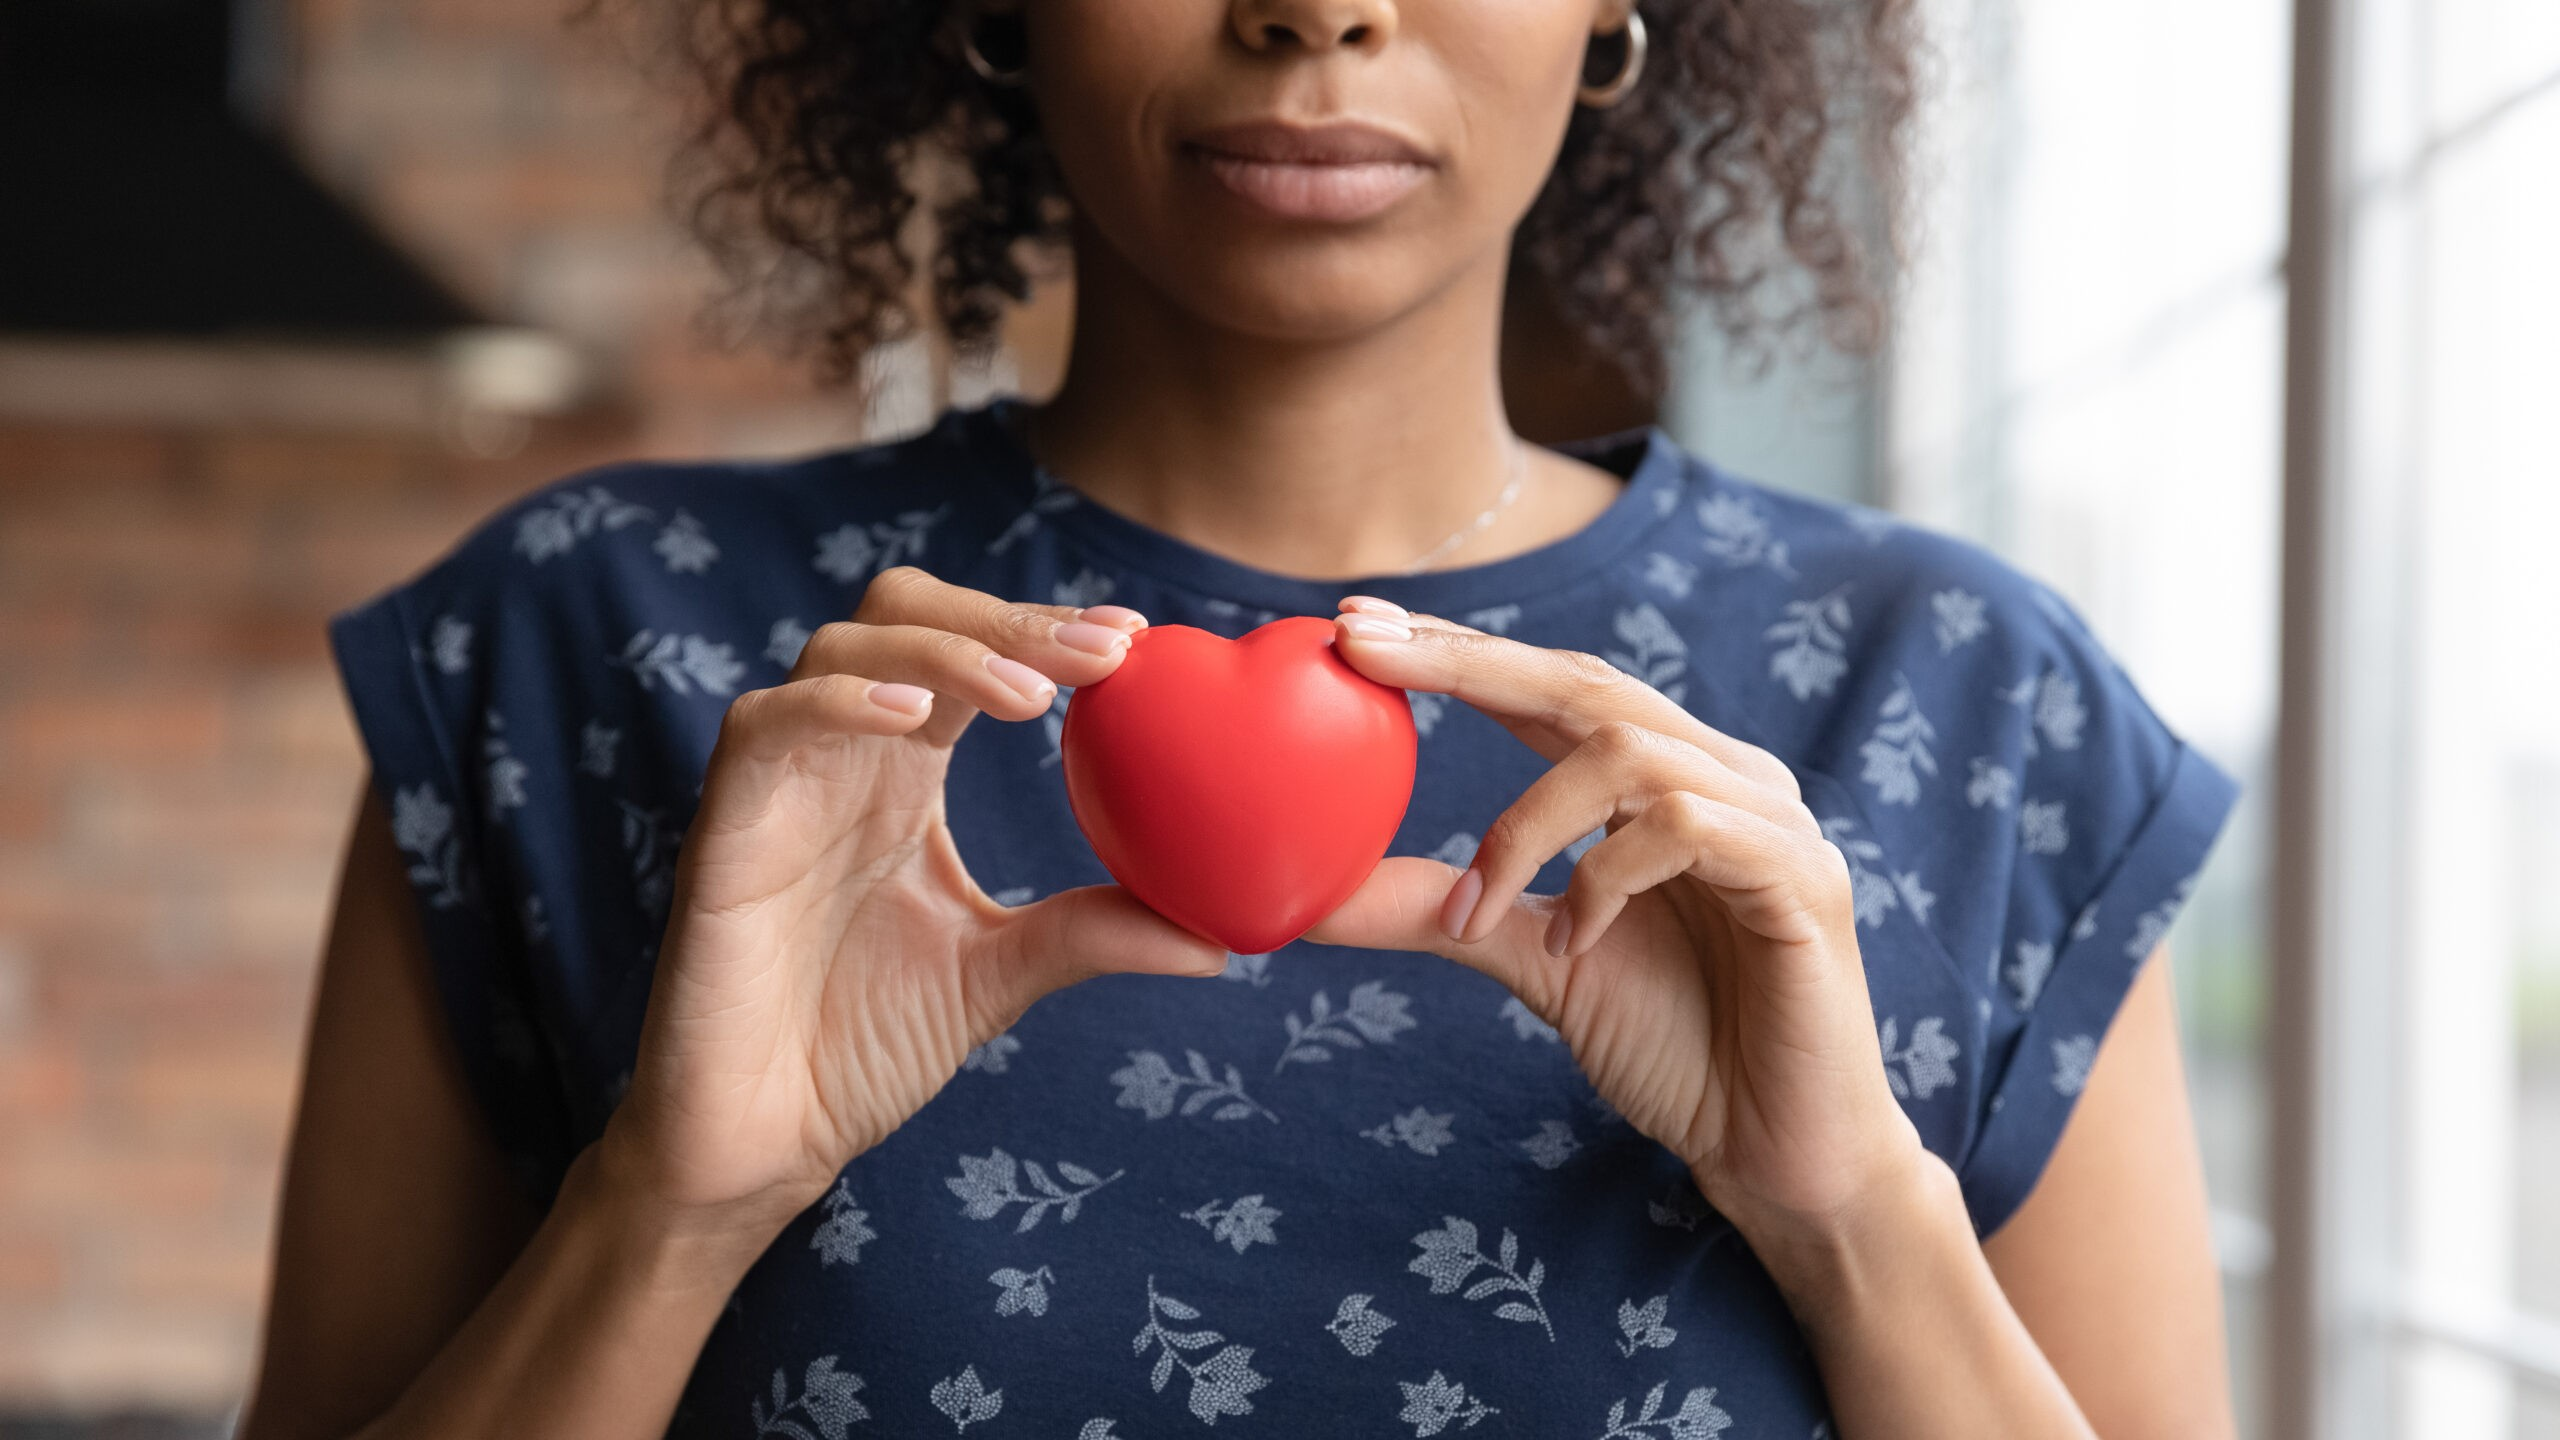 Volunteer with your heart